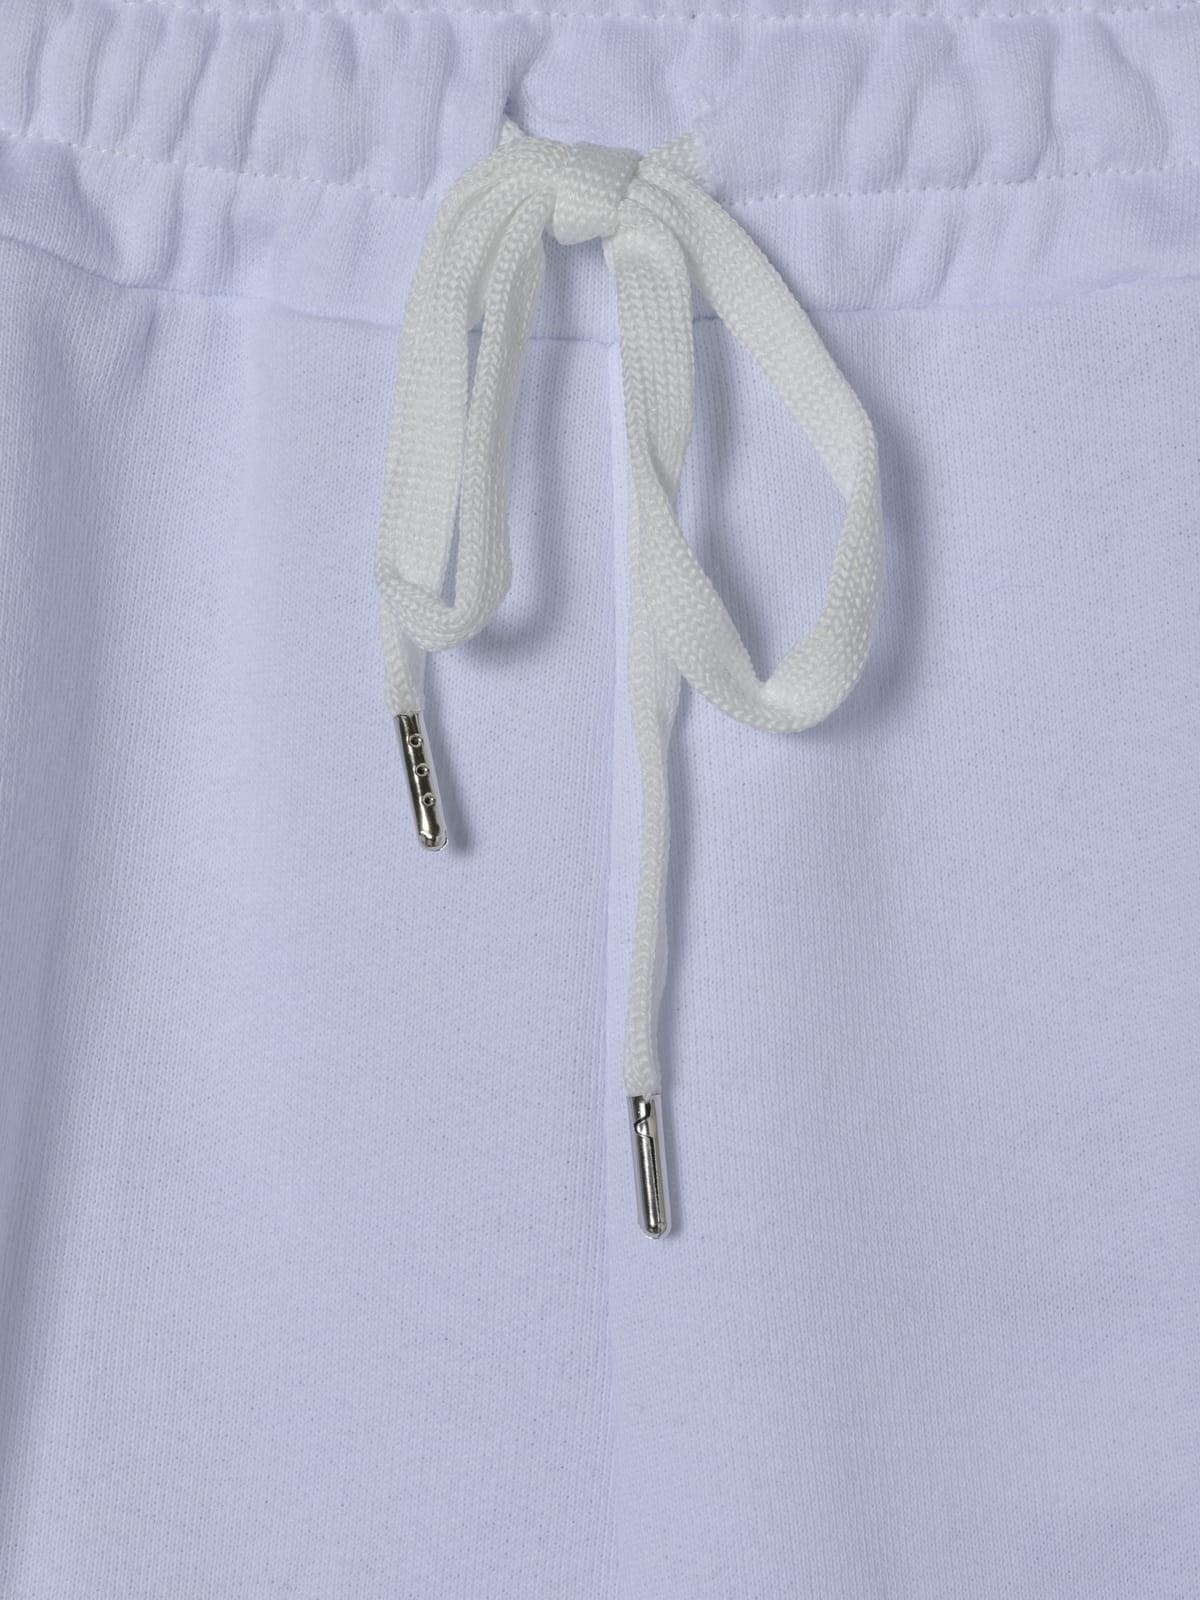 Pantalón mujer sport liso cordón Blanco